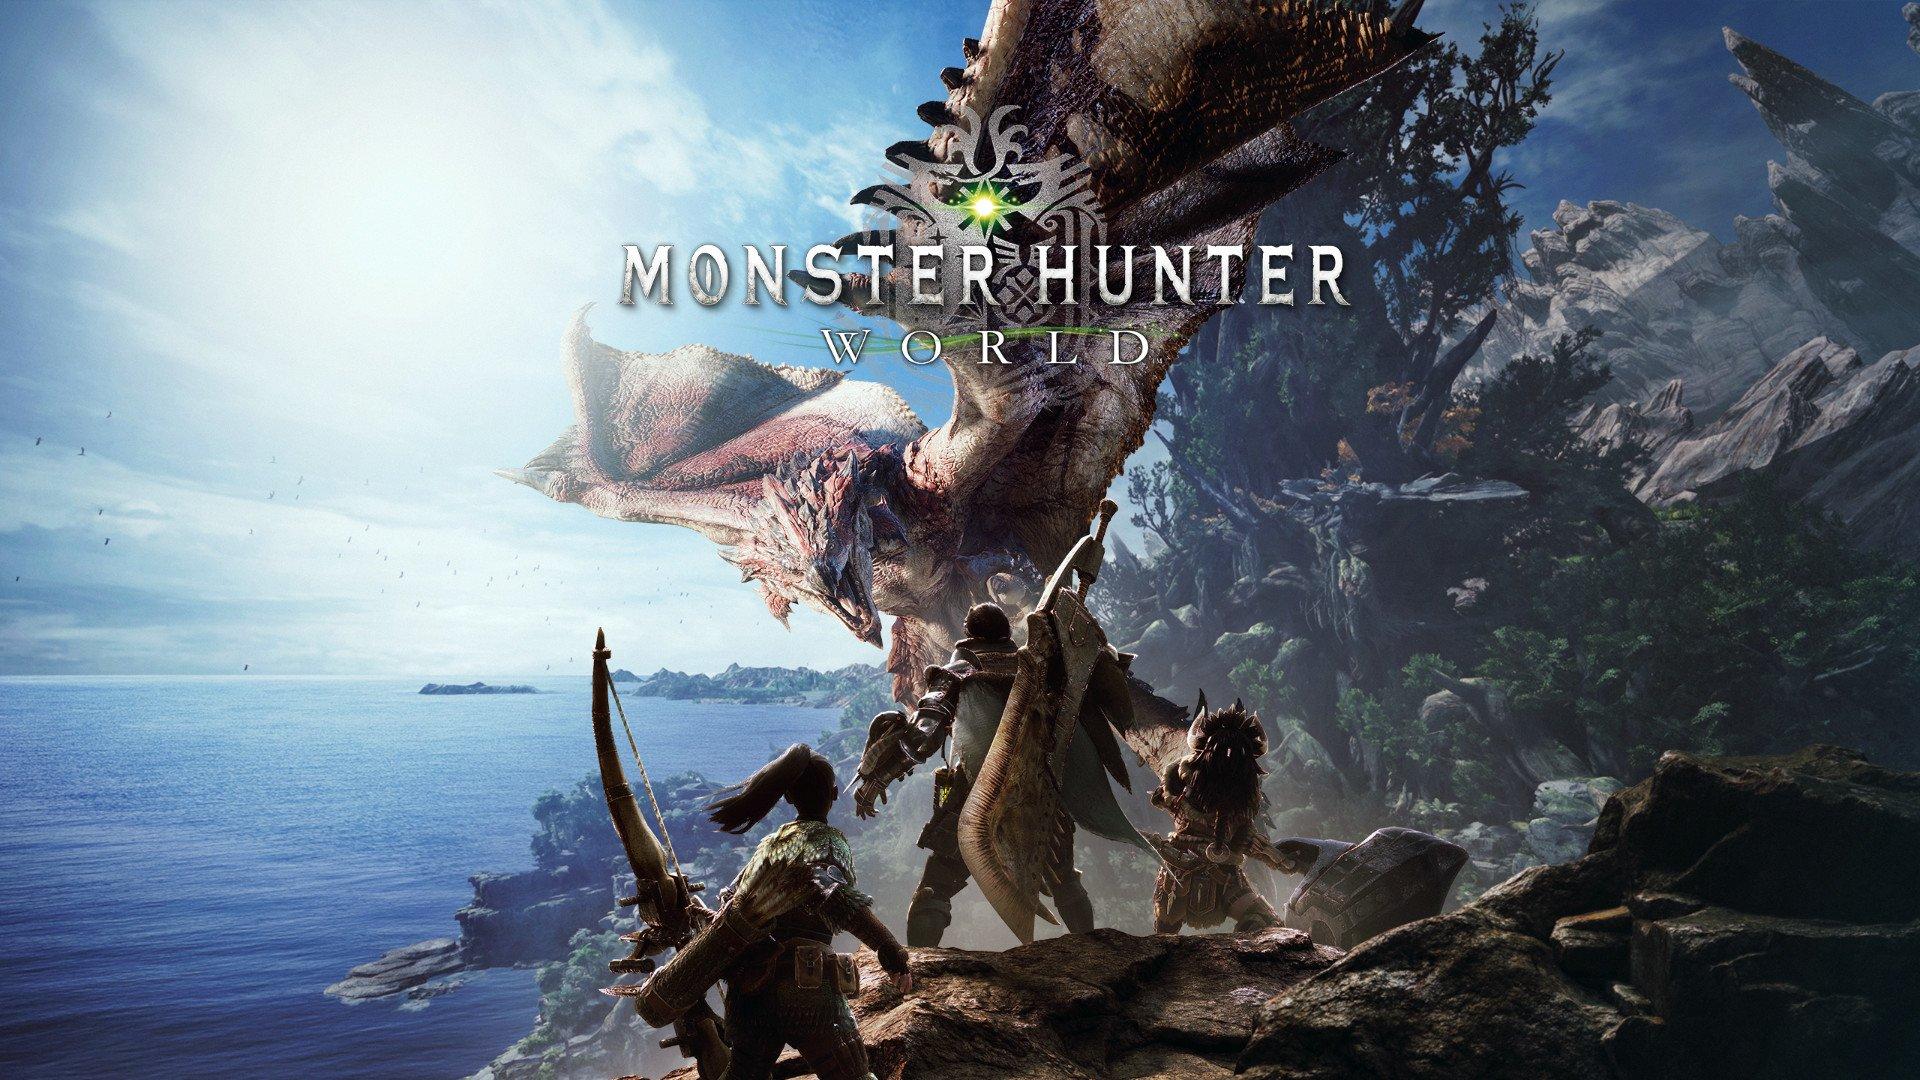 Monster Hunter: World do przetestowania za darmo do 20 maja na PS4